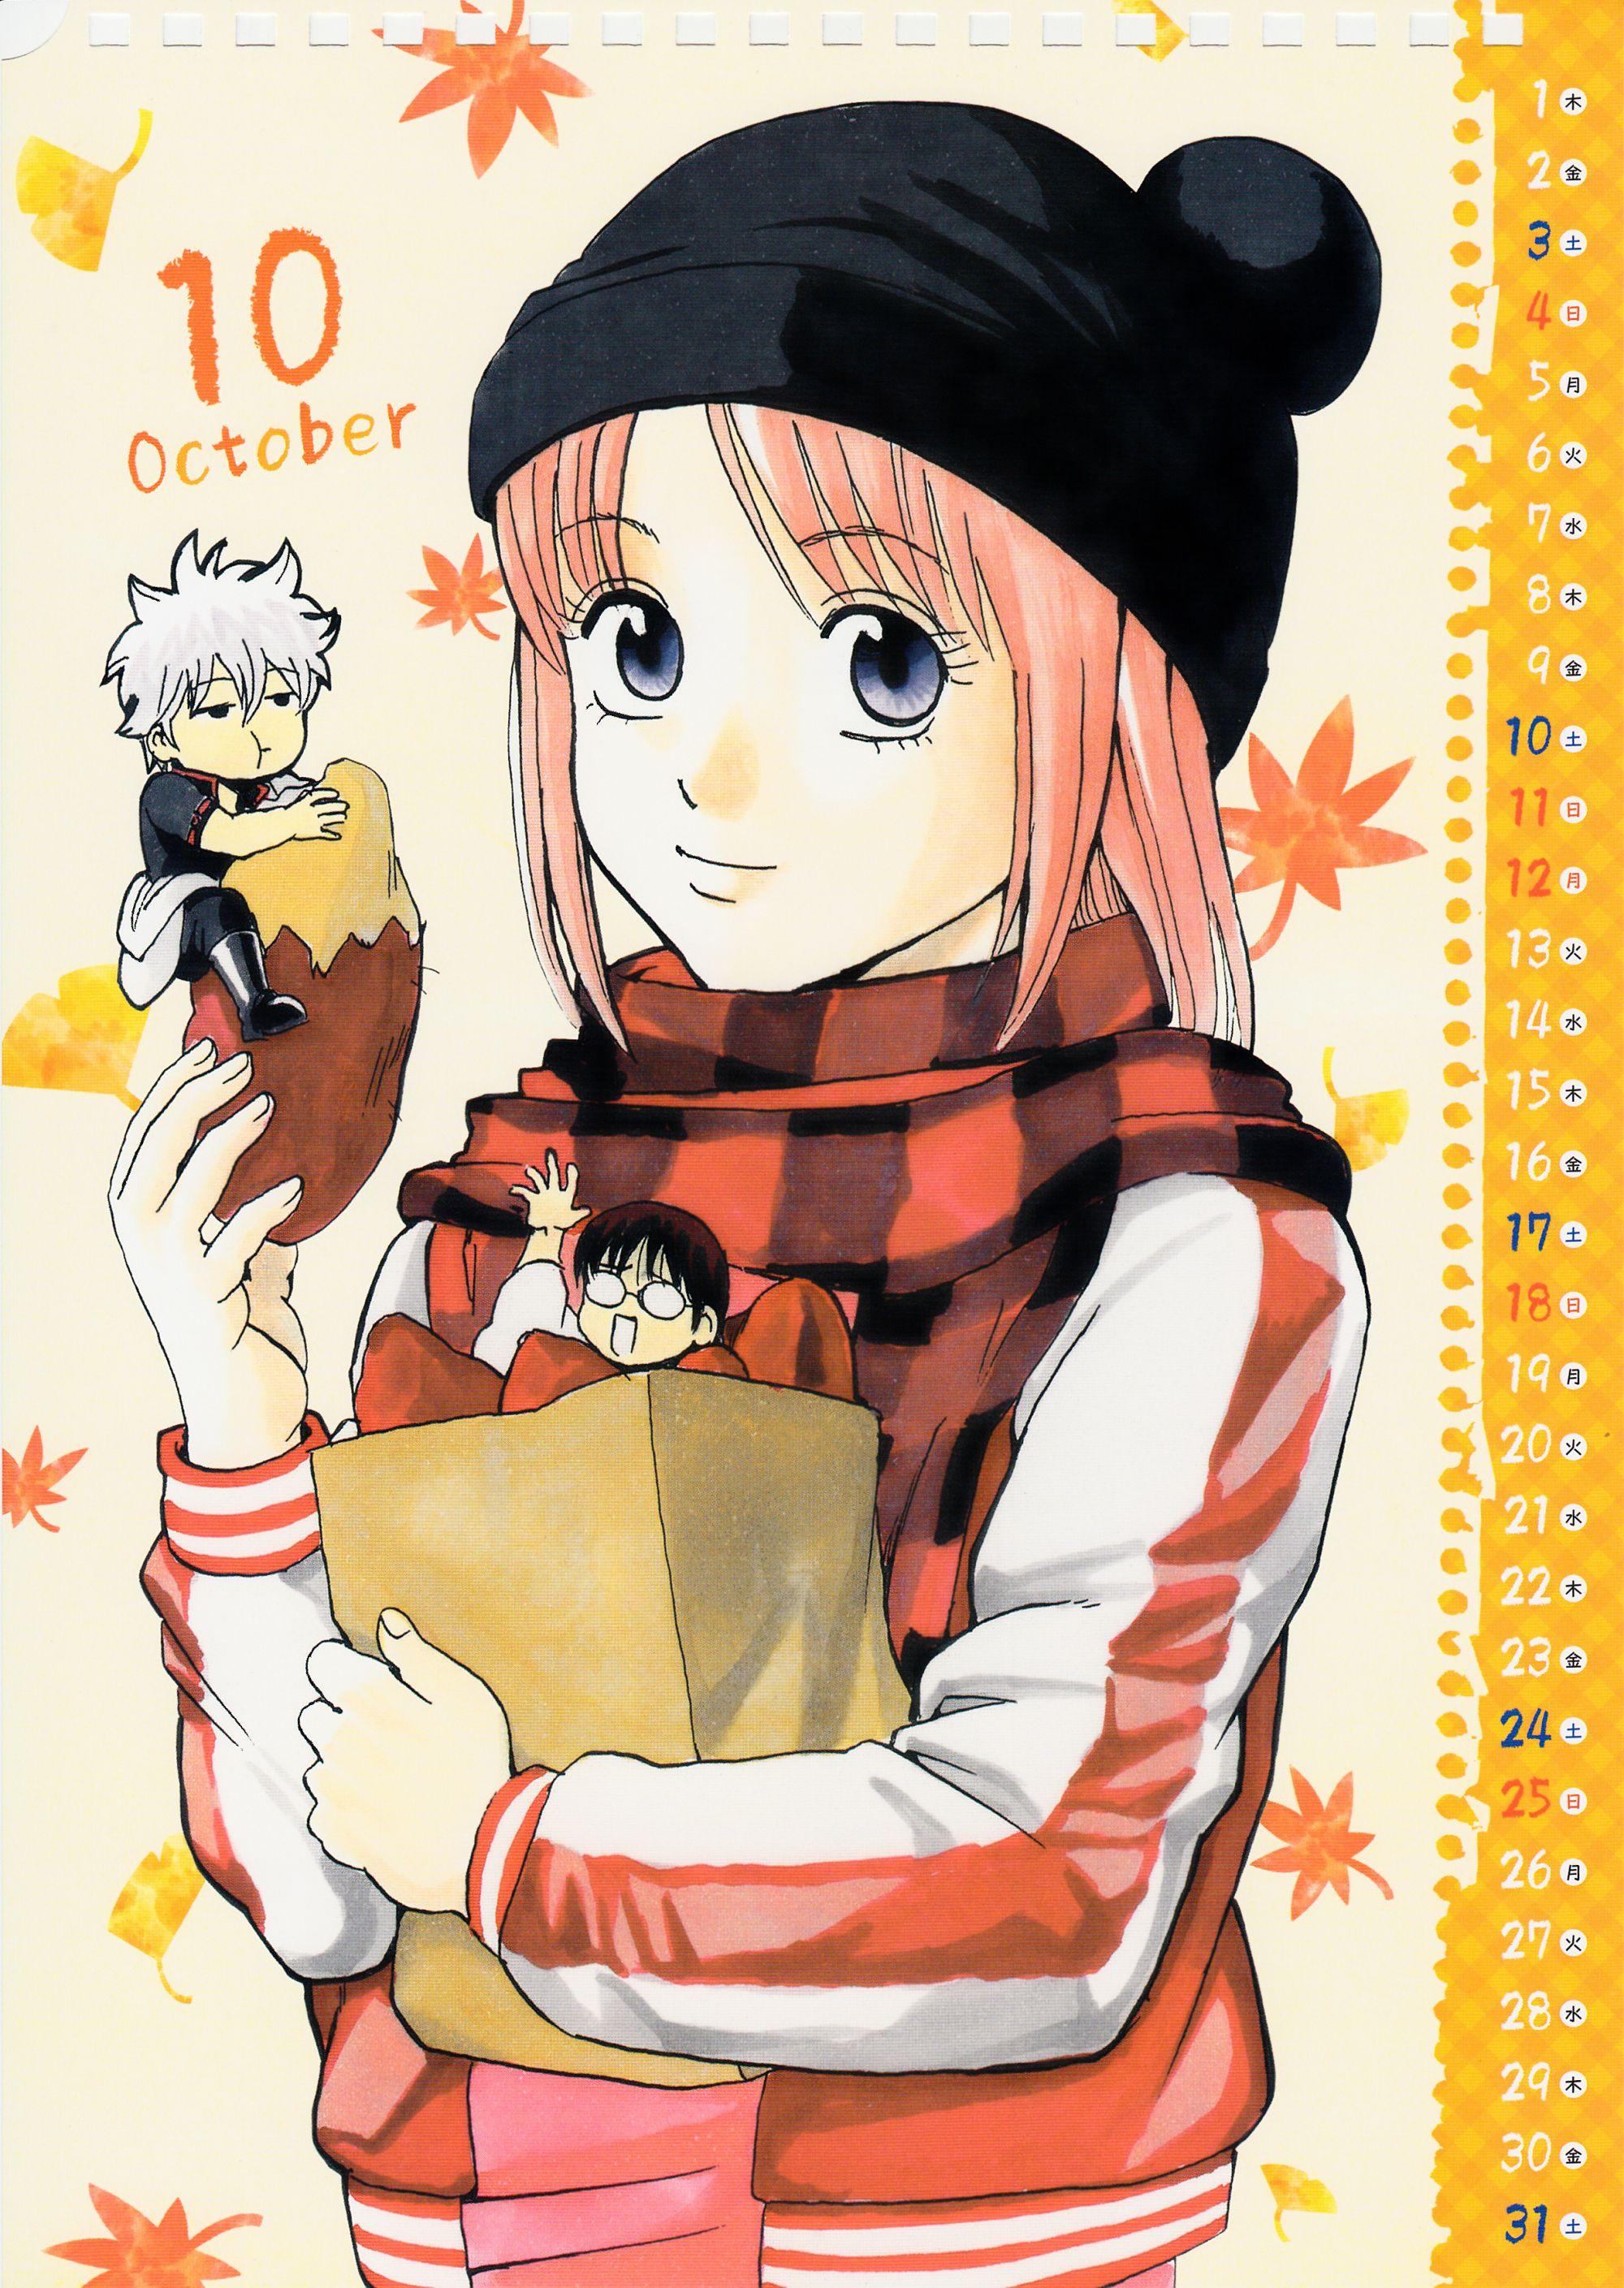 Gintama Calendar Yorozuya Oct 神楽 イラスト 銀魂 イラスト